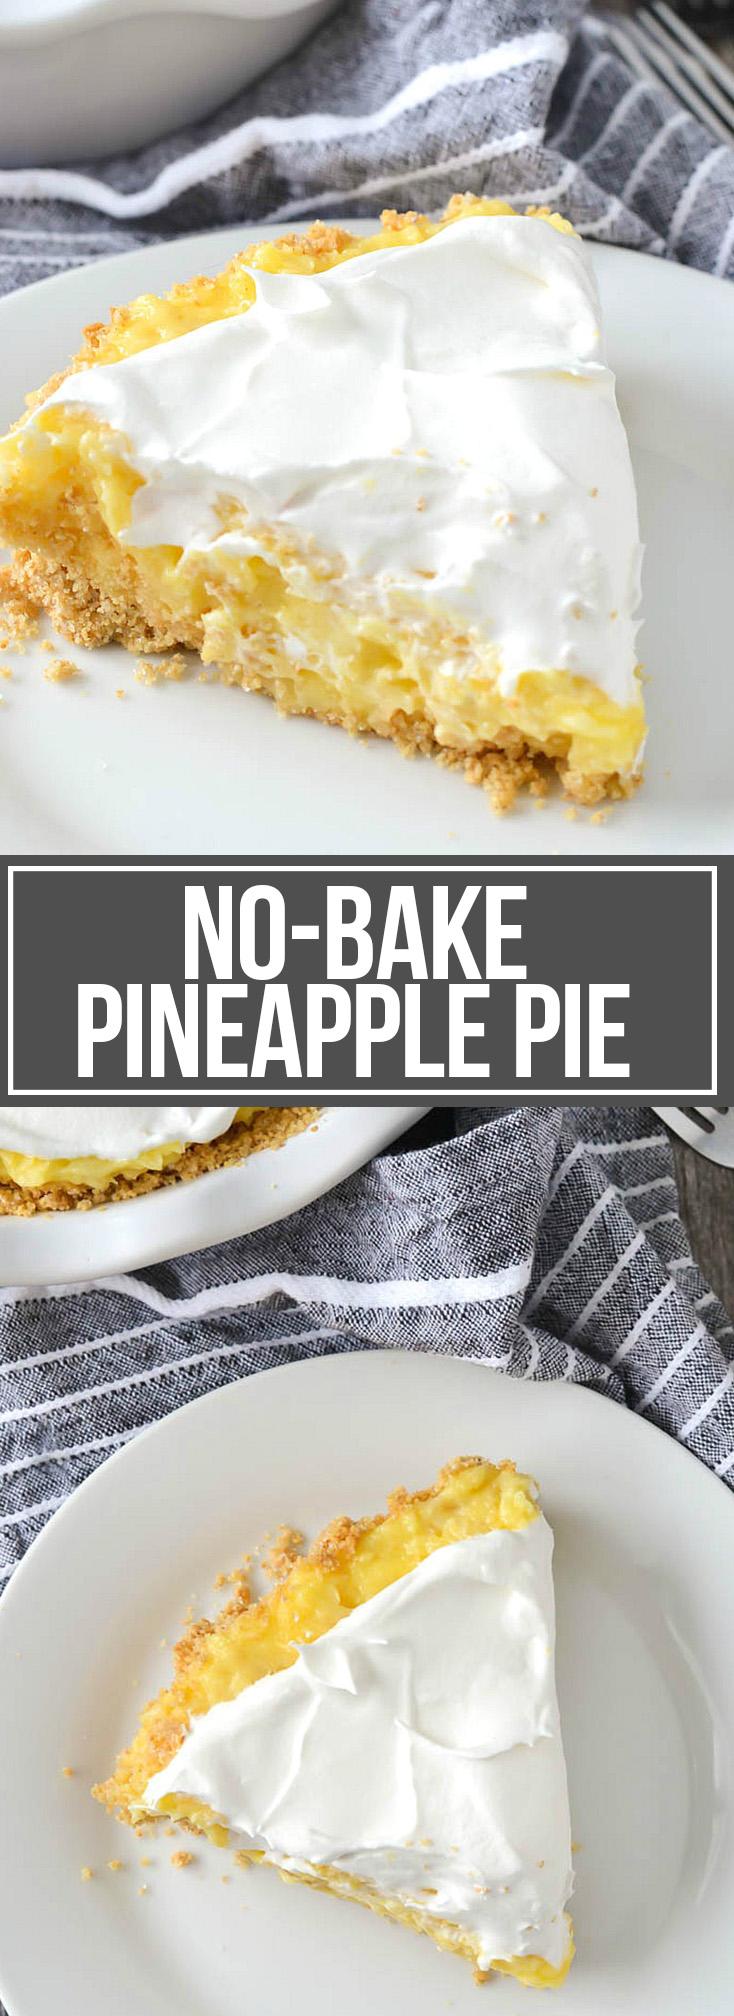 NO BAKE PINEAPPLE PIE